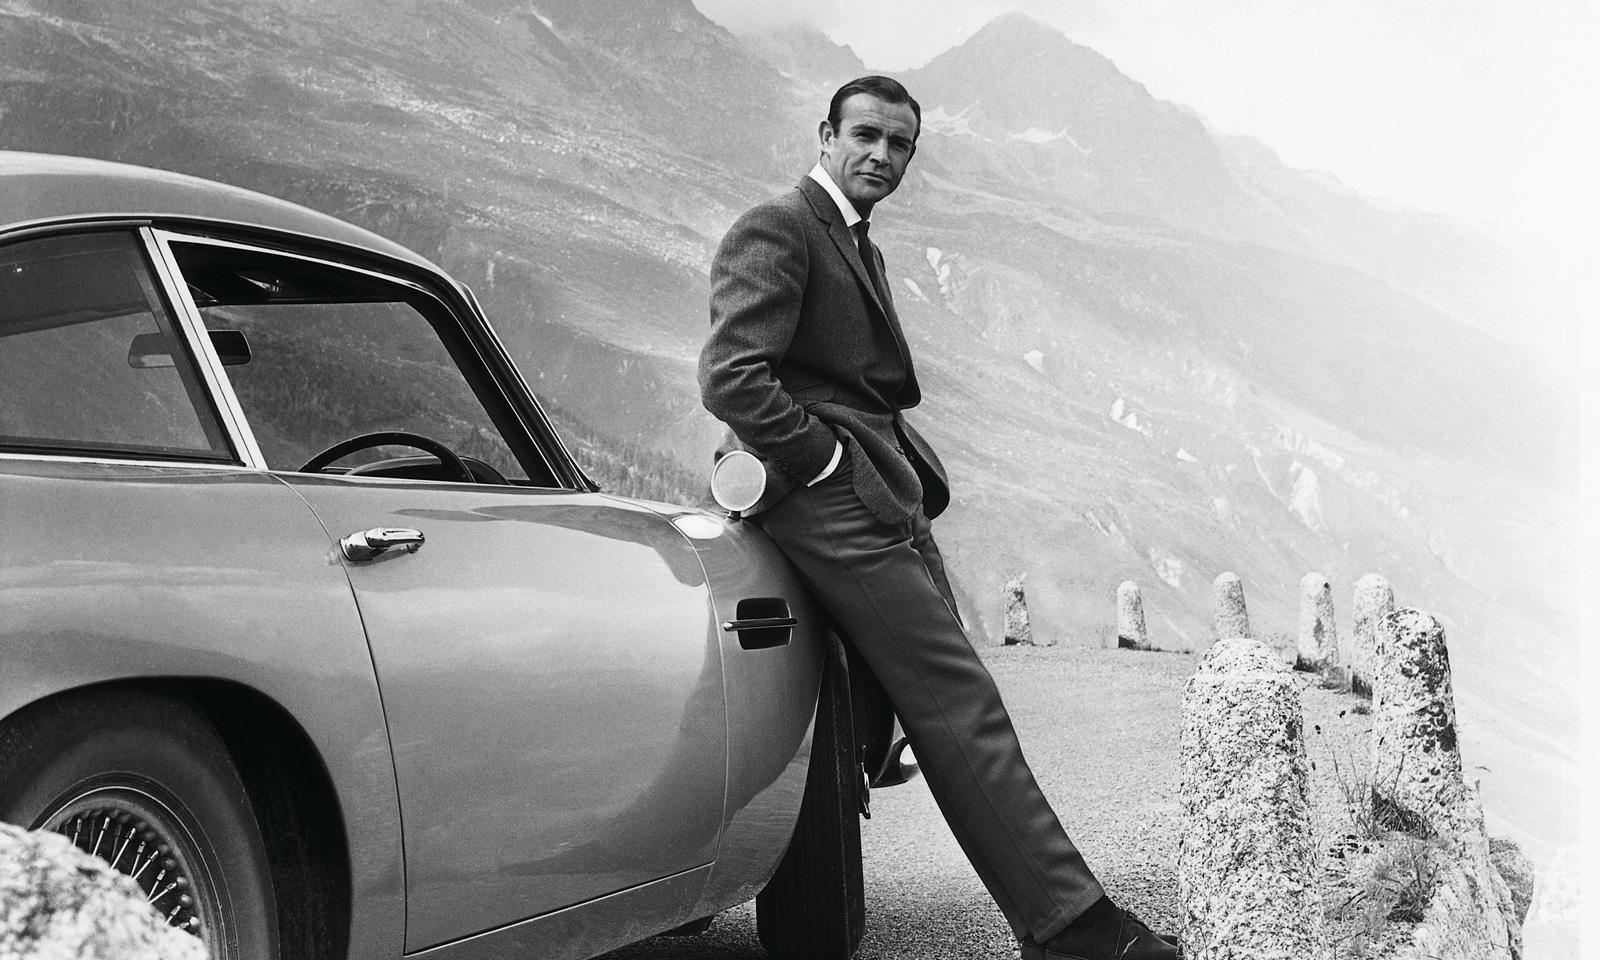 James Bond Day